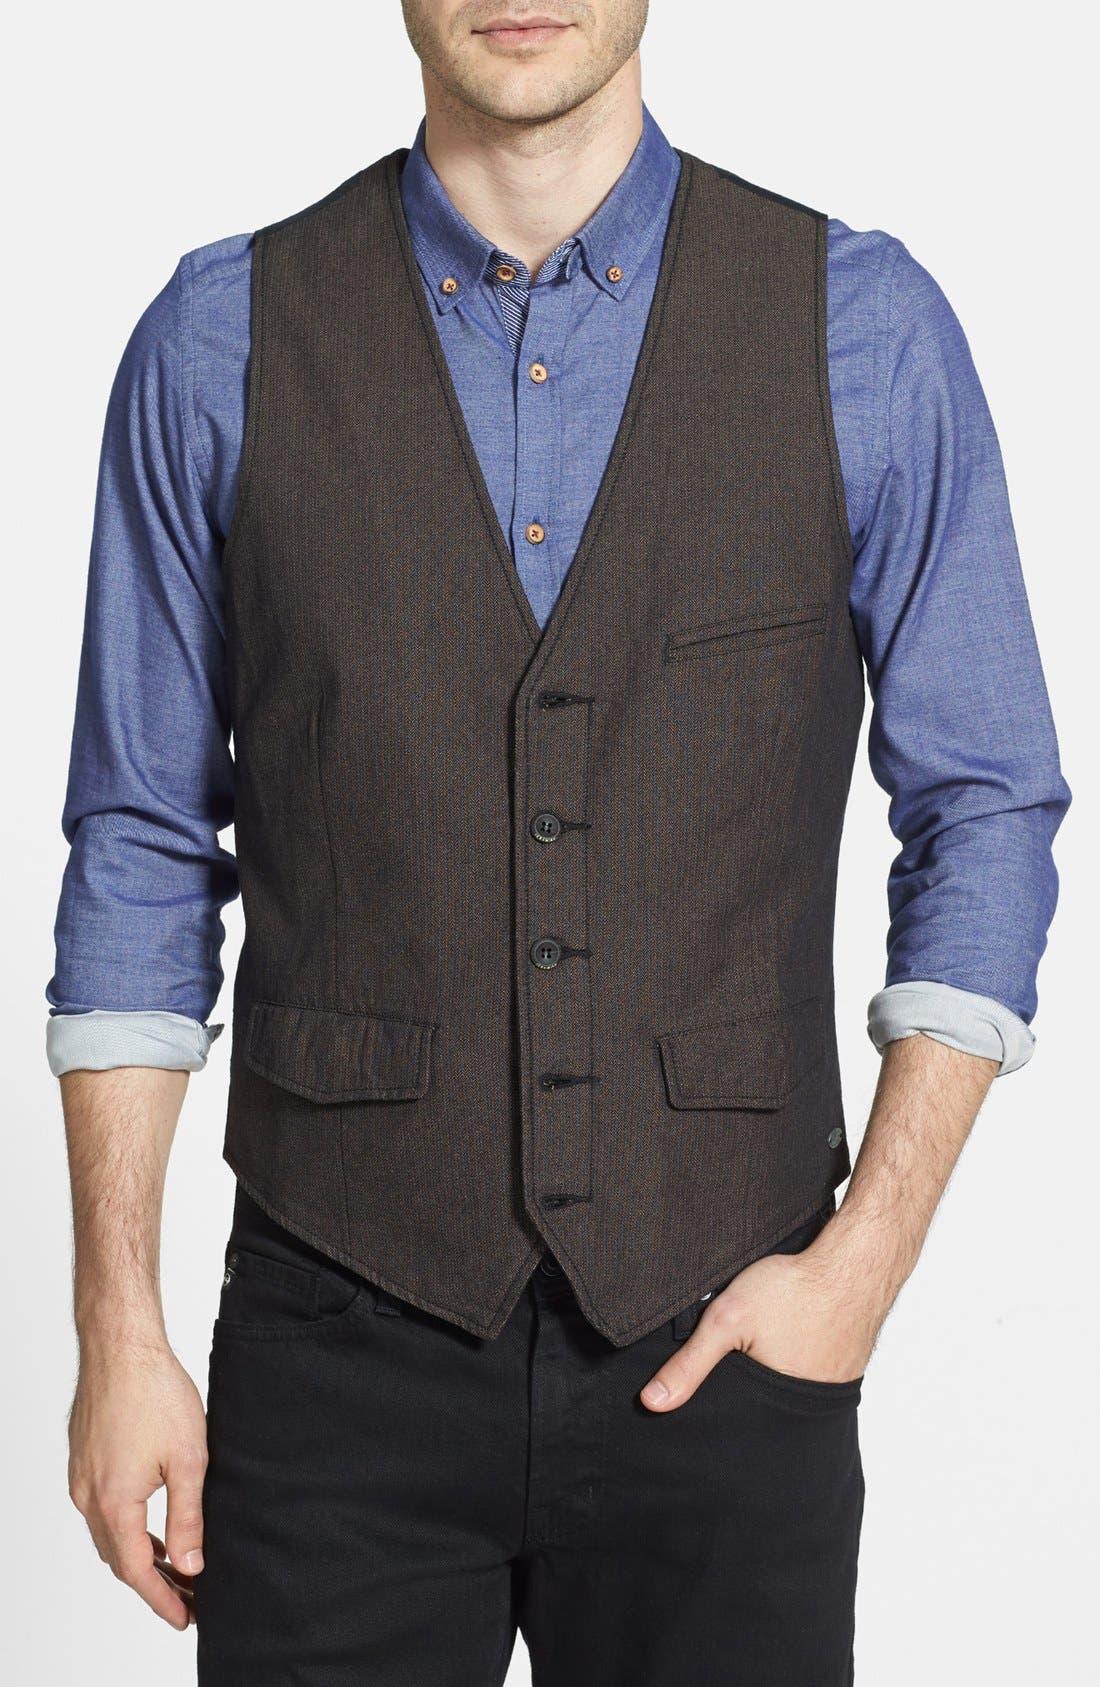 Alternate Image 1 Selected - Jeremiah 'Mumford' Herringbone Vest